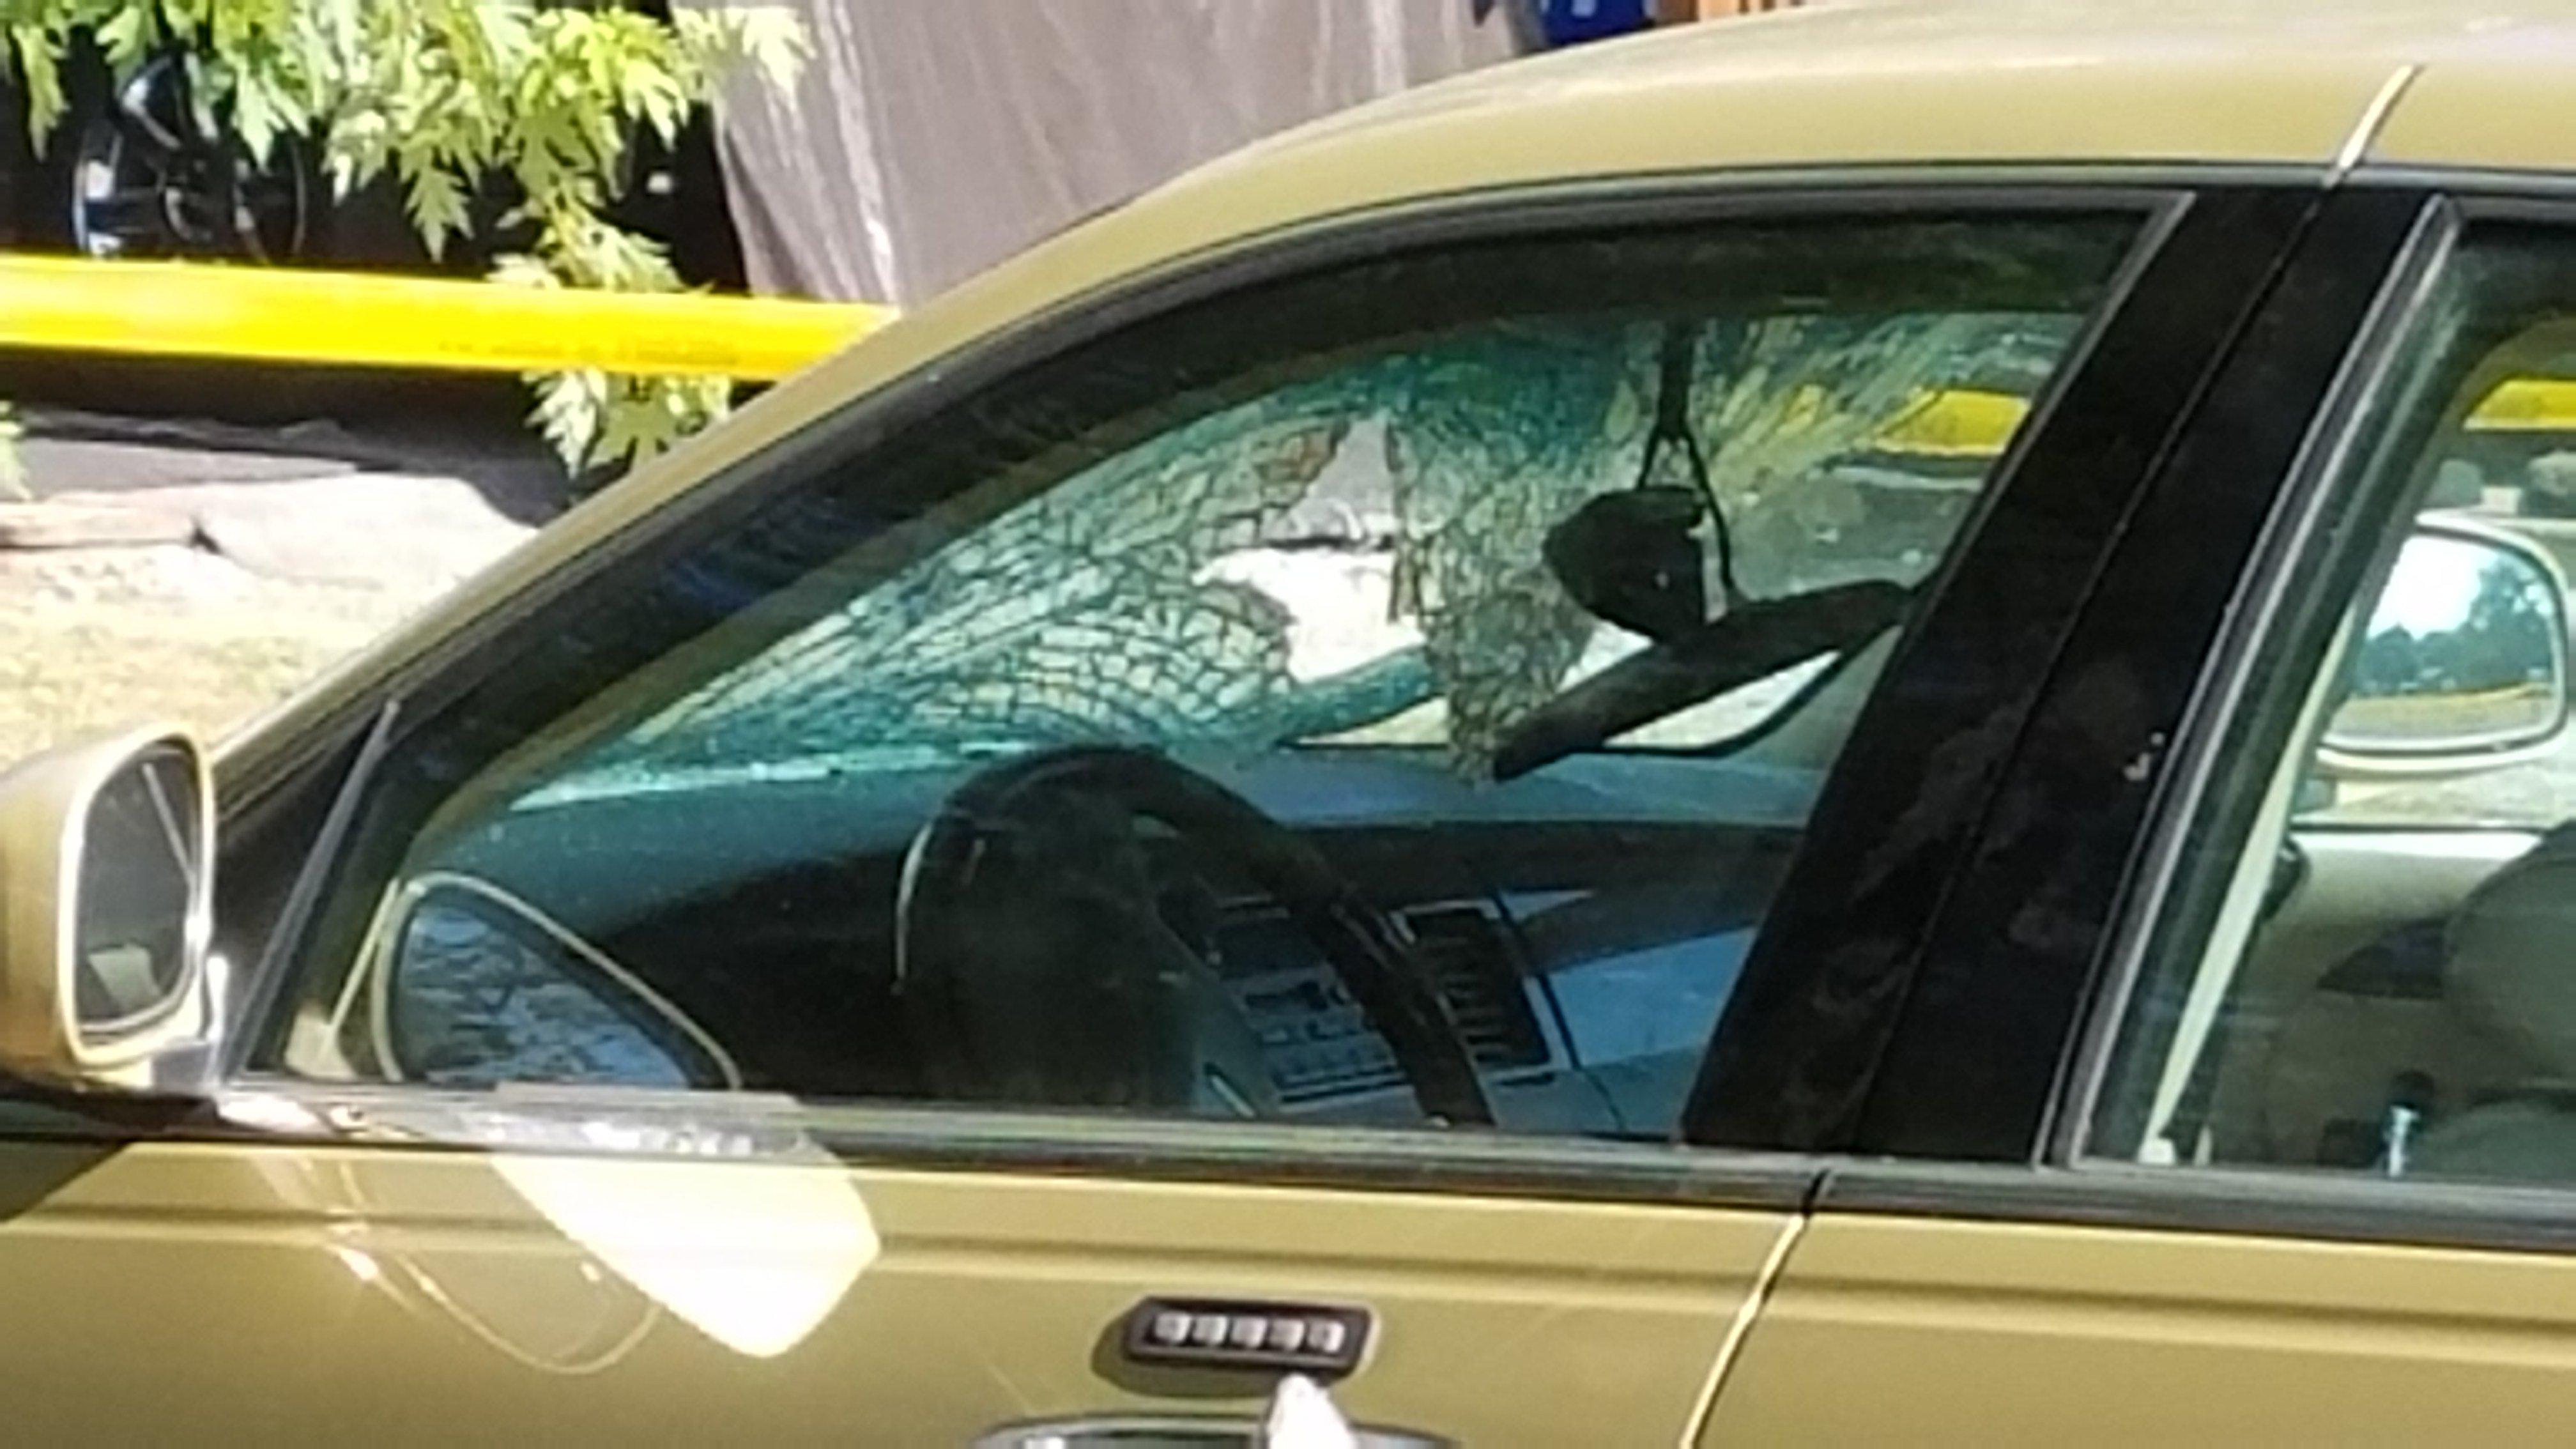 Damaged windshield at the scene.